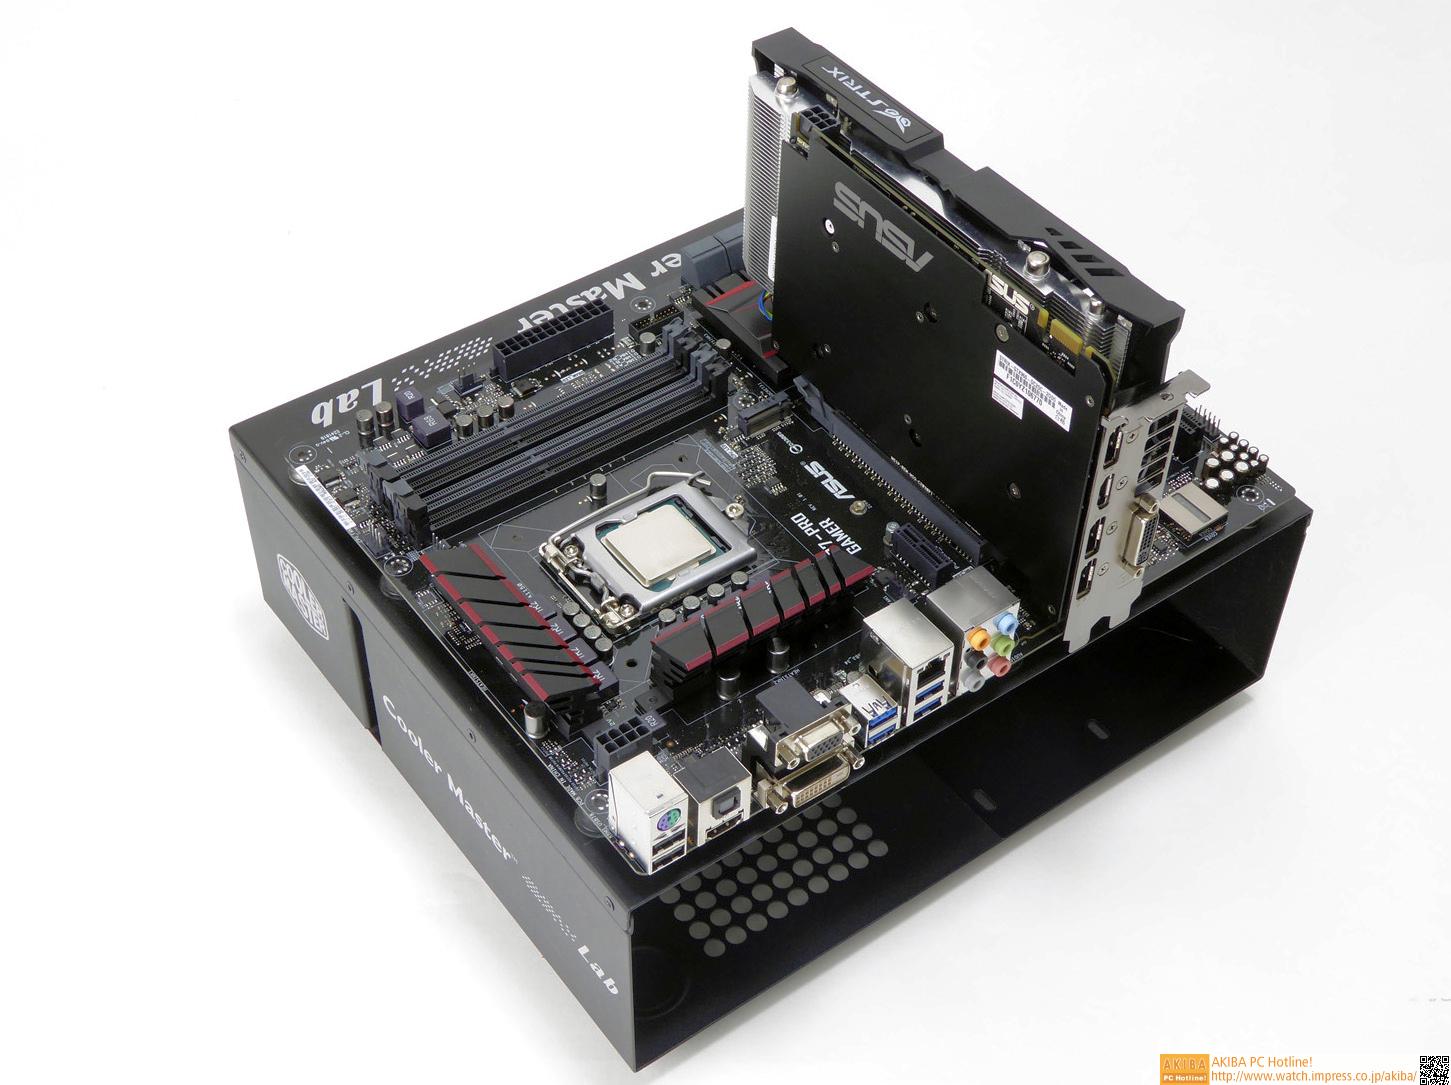 Intel Core i7-4790K、ASUSTeK H97-PRO GAMER、ASUSTeK STRIX-GTX960-DC2OC-2GD5を組み合わせた今回の最上位構成